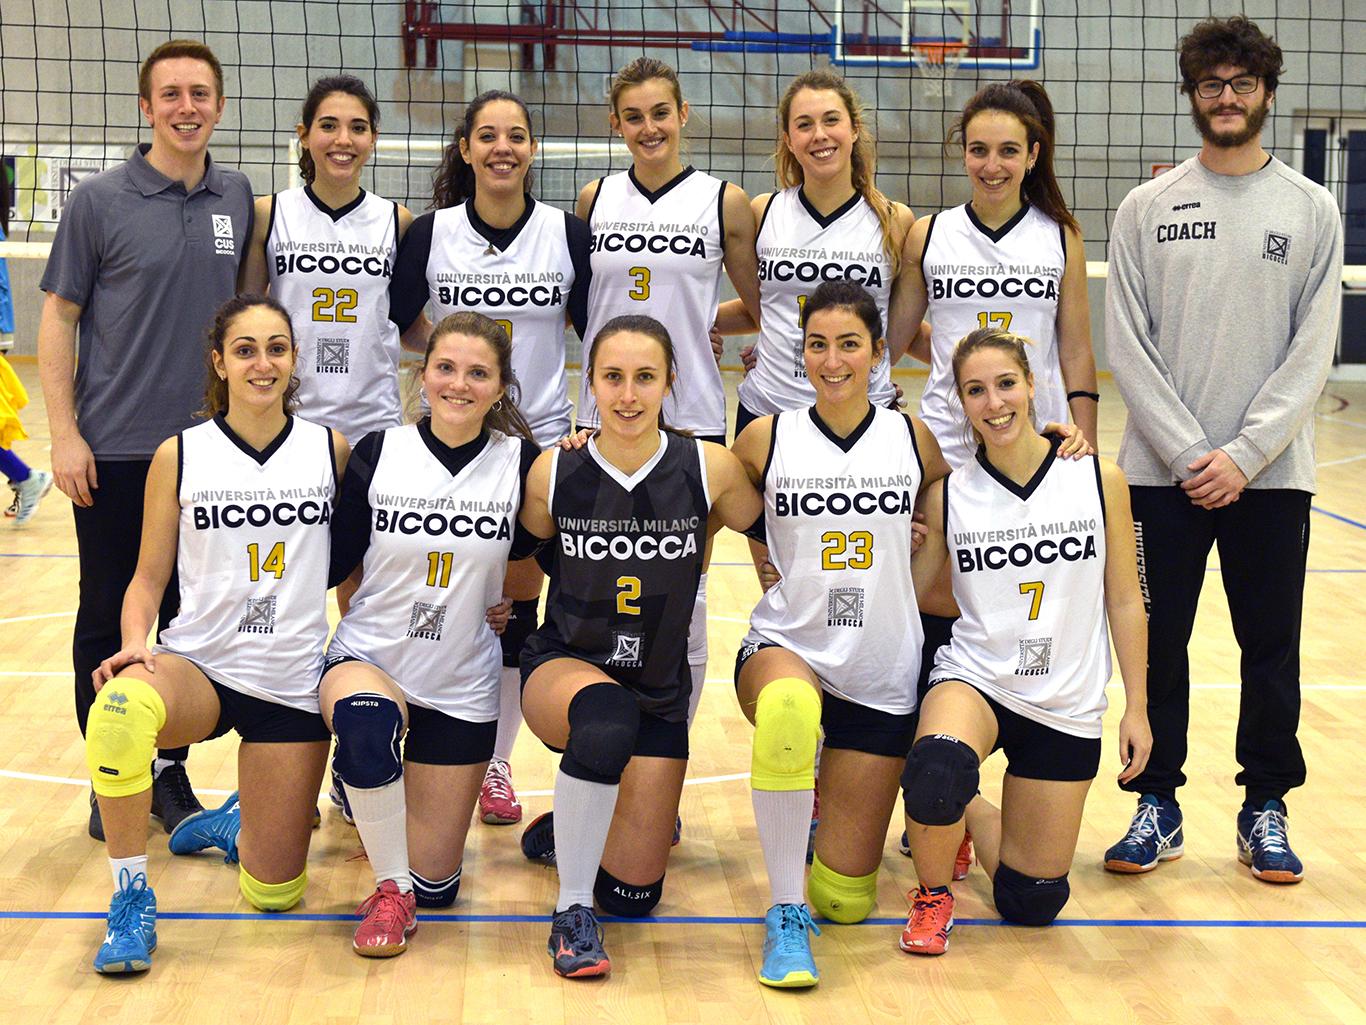 CUS Bicocca • volley femminile 2019/20 • federale